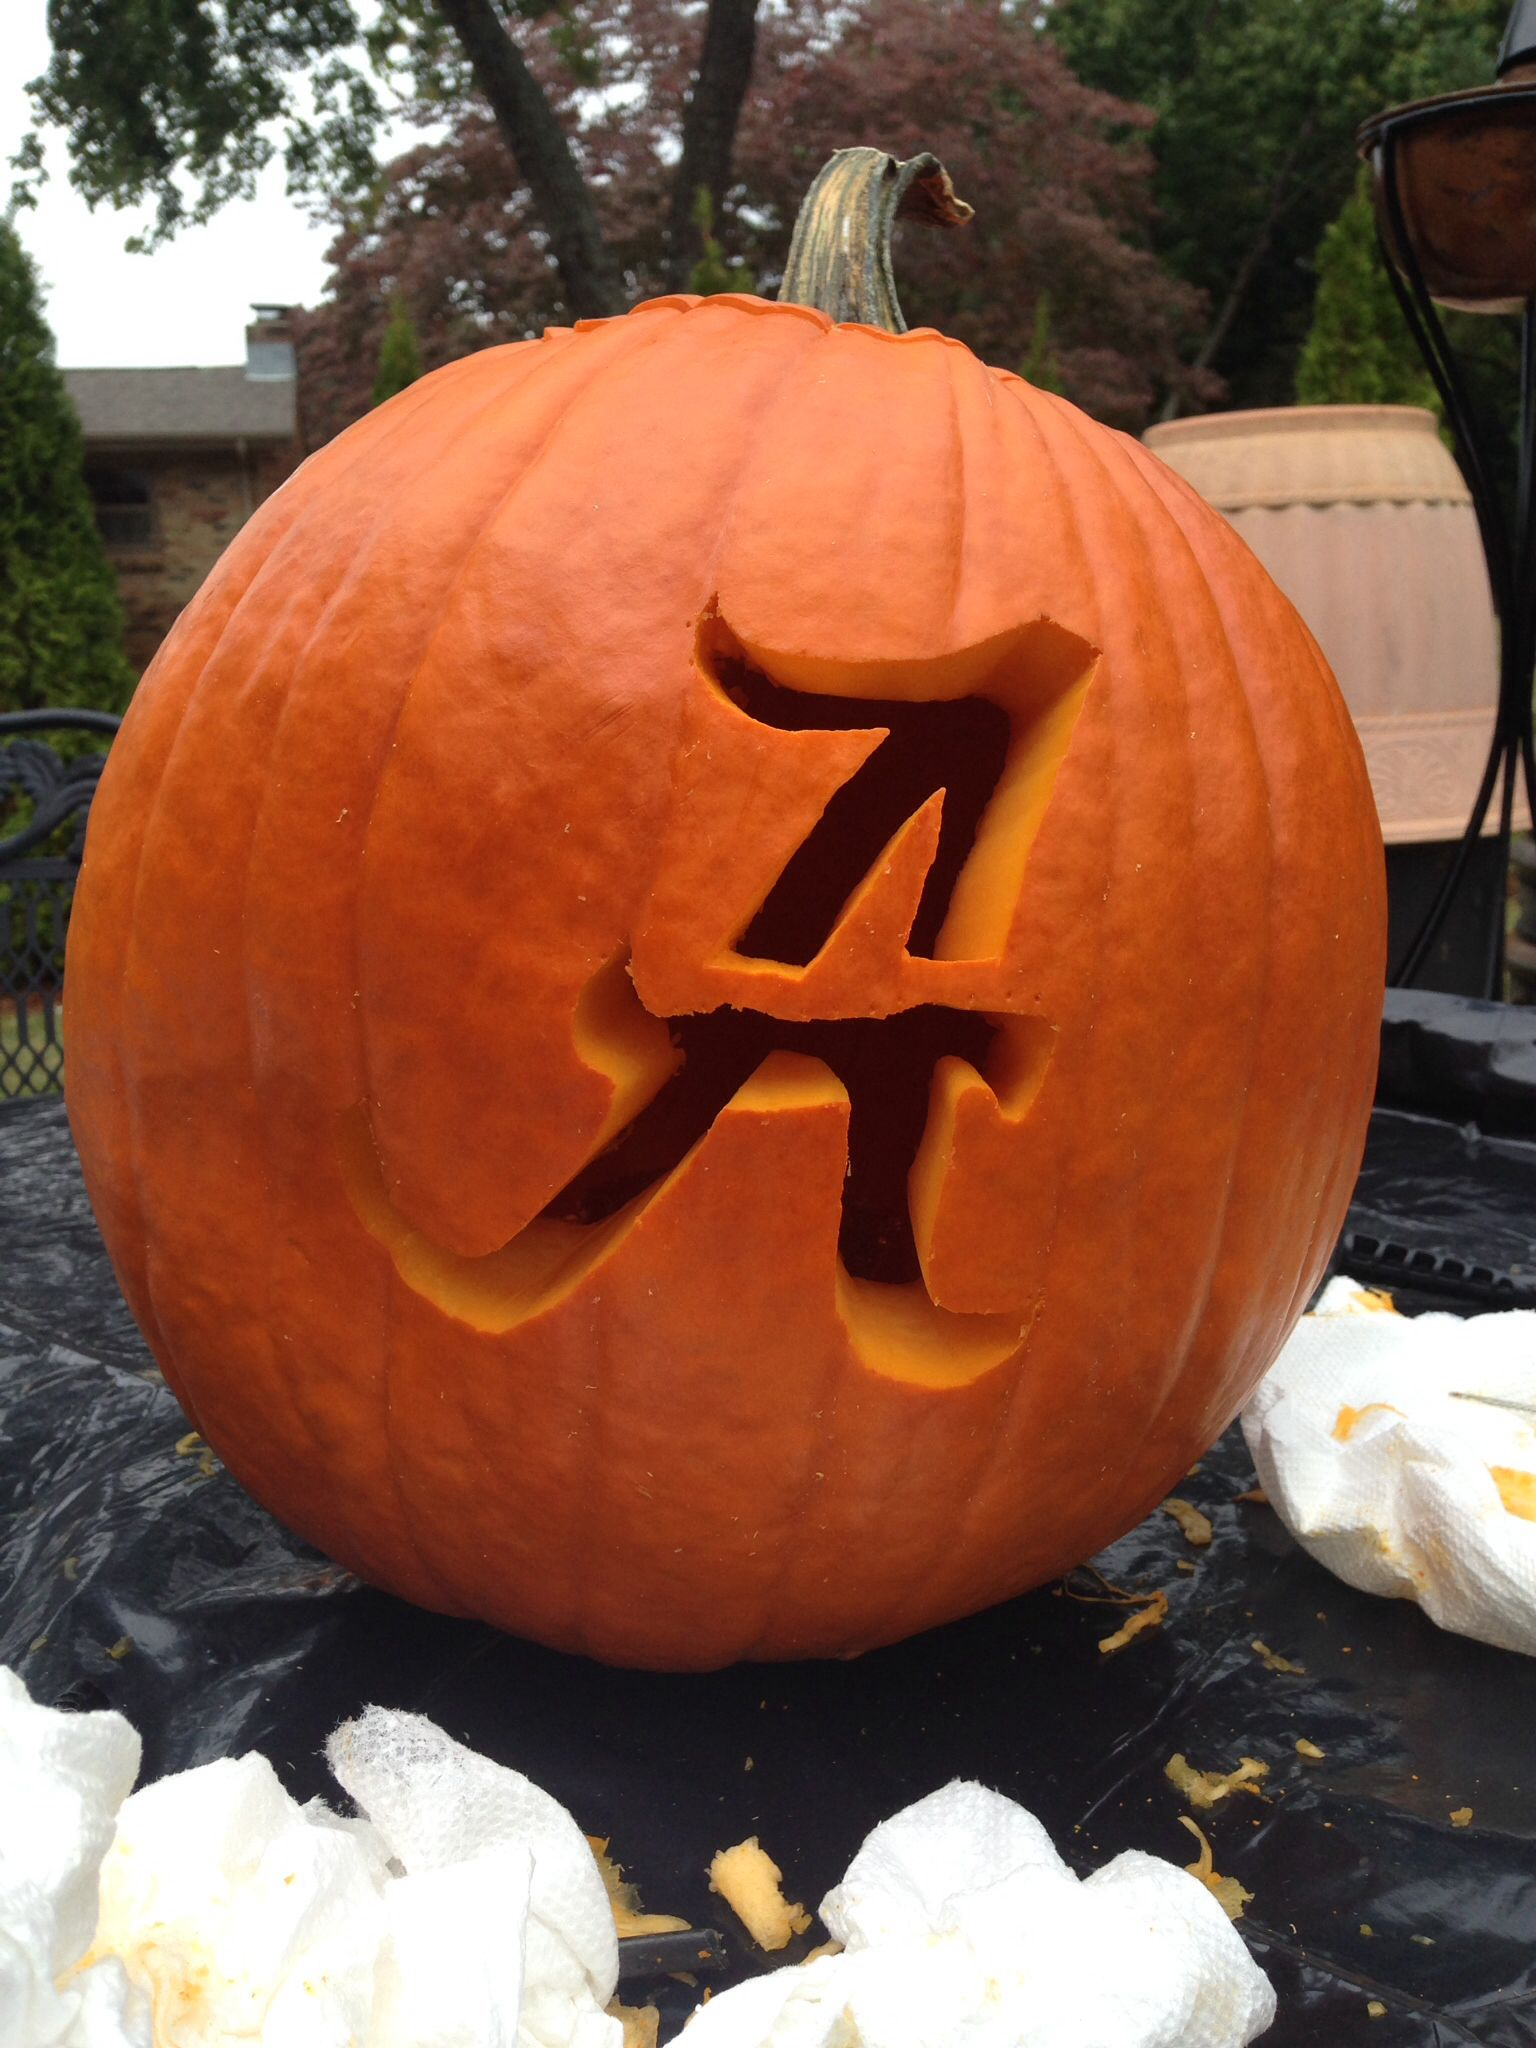 Notre Dame Football Pumpkin Carving Patterns Www Topsimages Com